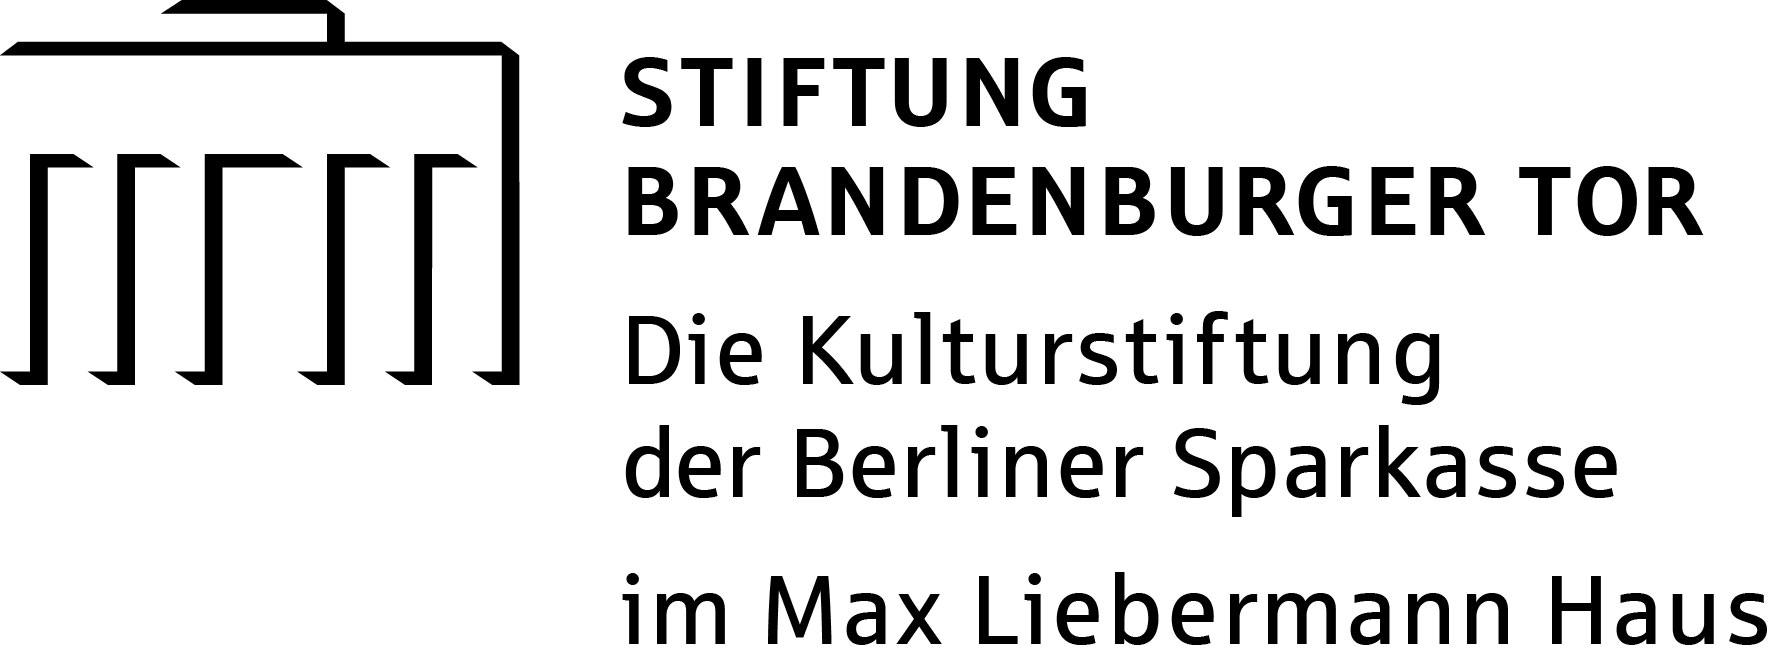 Stiftung Brandenburger Tor